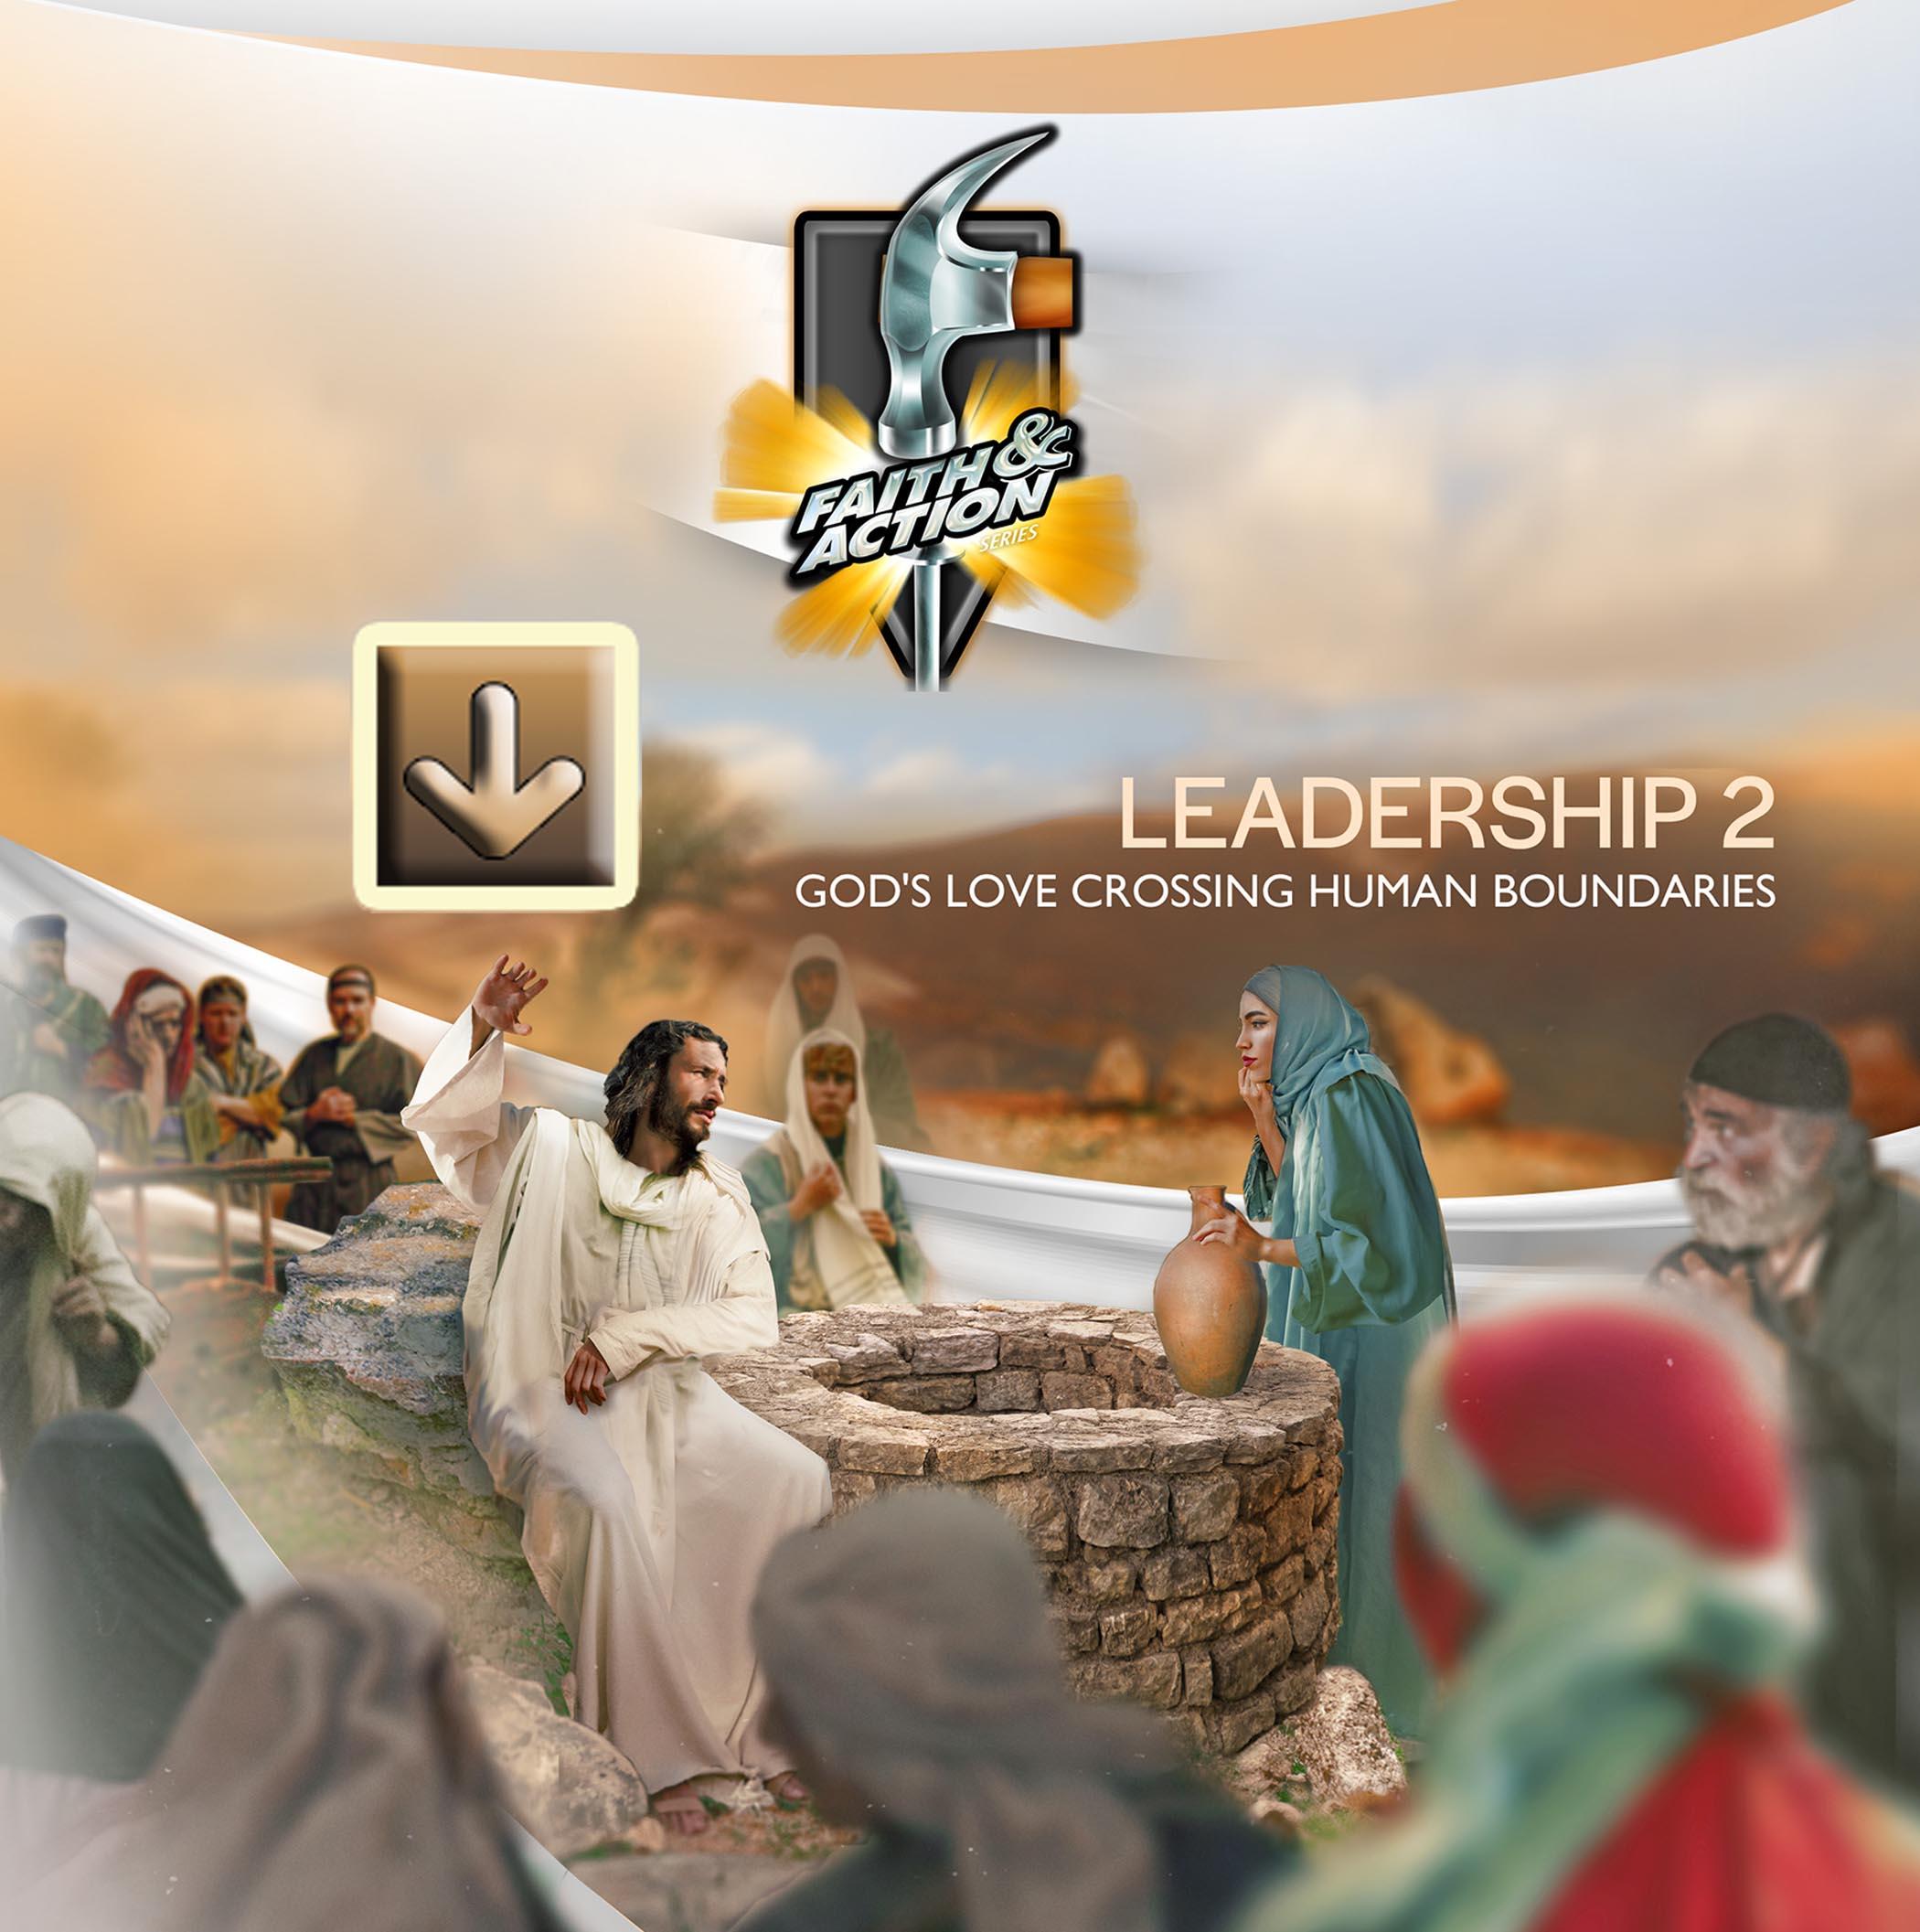 Leadership 2: God's Love Crossing Human Boundaries - eVisuals Zipped Download - 4431-39EX